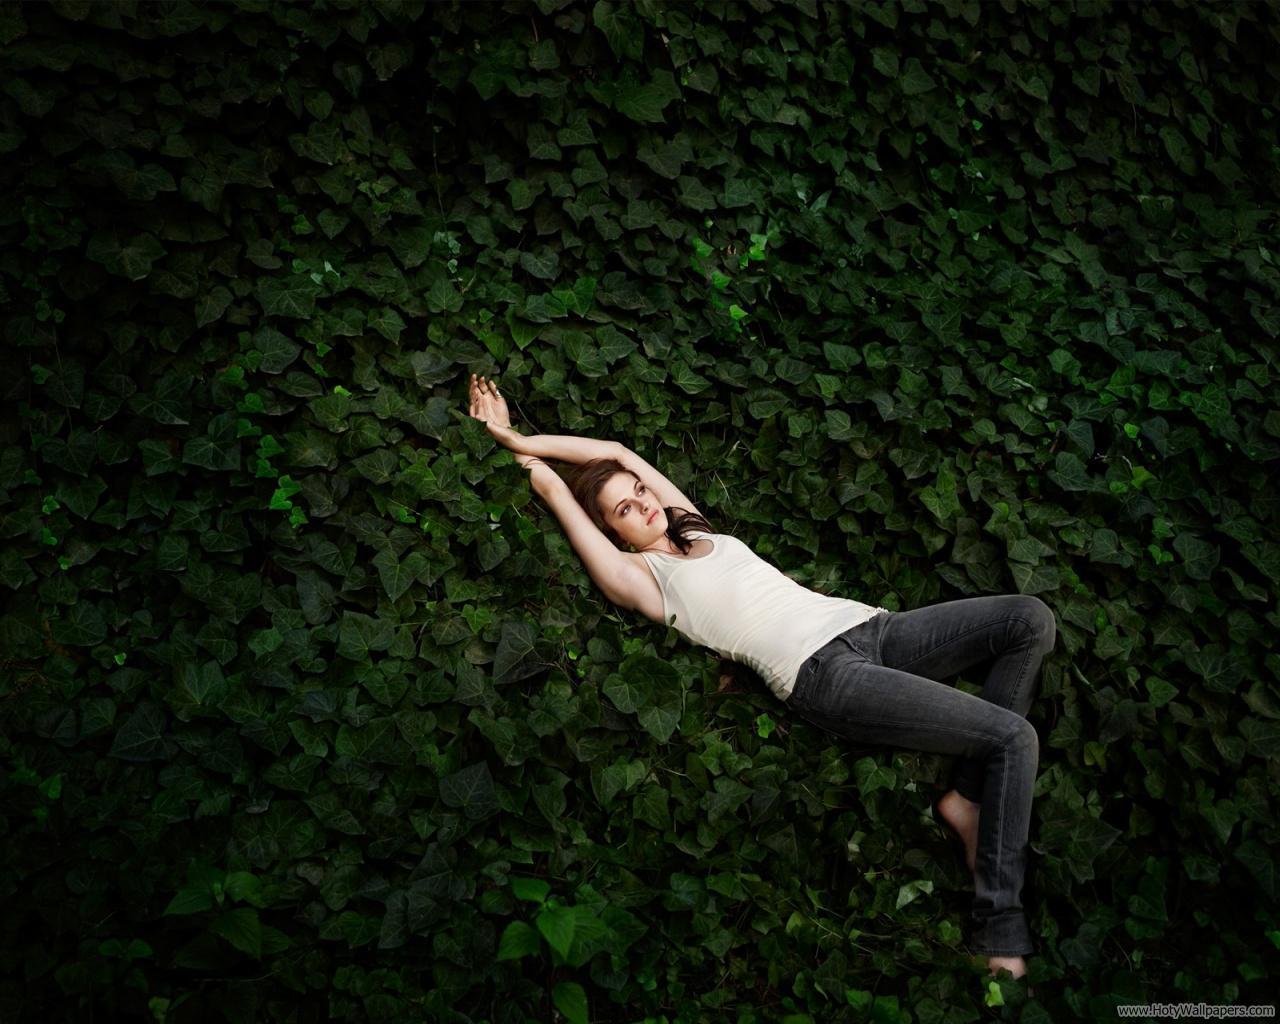 http://1.bp.blogspot.com/-V_-AkPBxERw/To68VW4rTKI/AAAAAAAALr4/6xXs9dPDgtw/s1600/kristen_stewart_glamour_photo_shoot.jpg